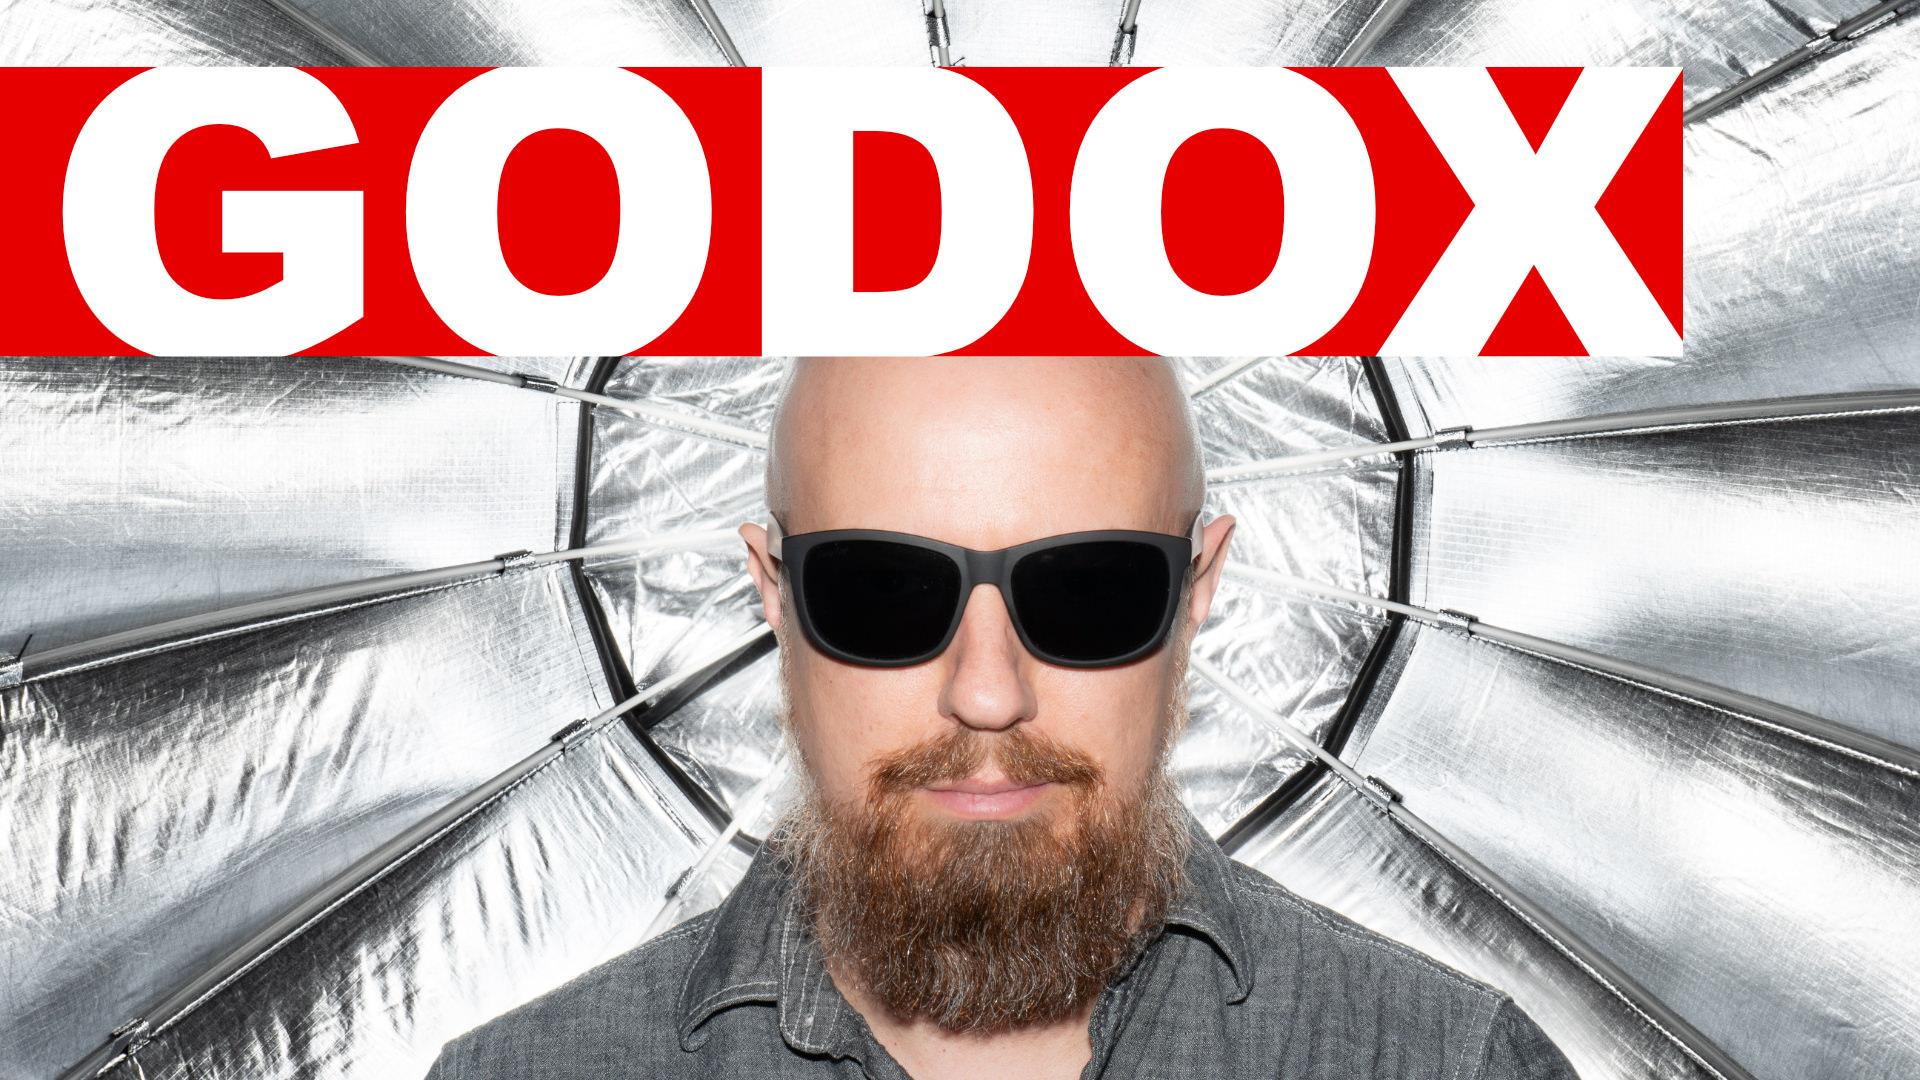 Godox Studio Flash QT1200 II & P120L Parabolic Softbox